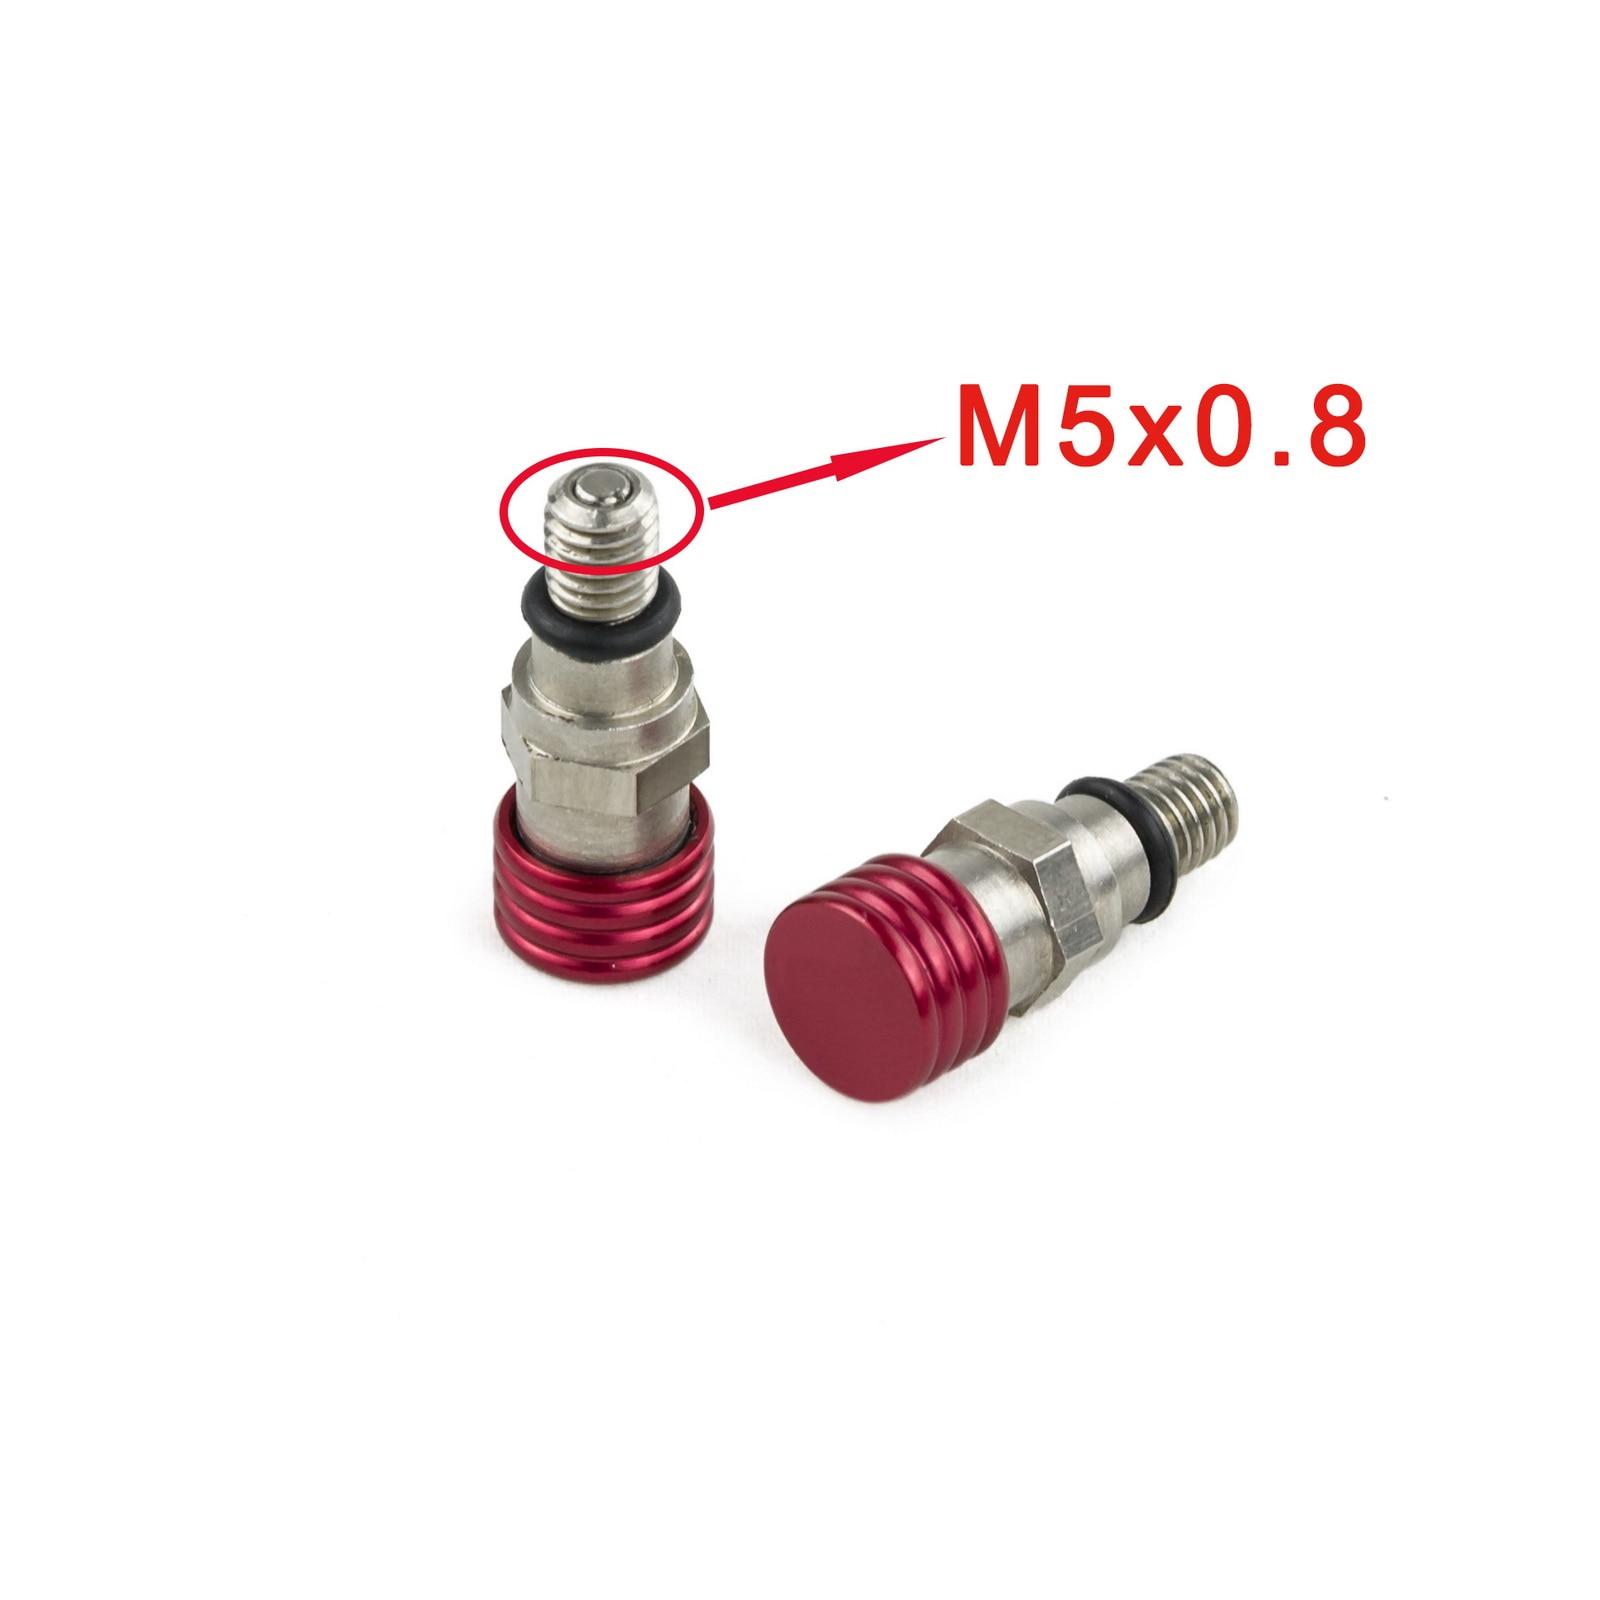 CR85 CR80 Big Wheel M5x0.8 Fork Air Pressure Bleeder Valves CNC For Honda CR80